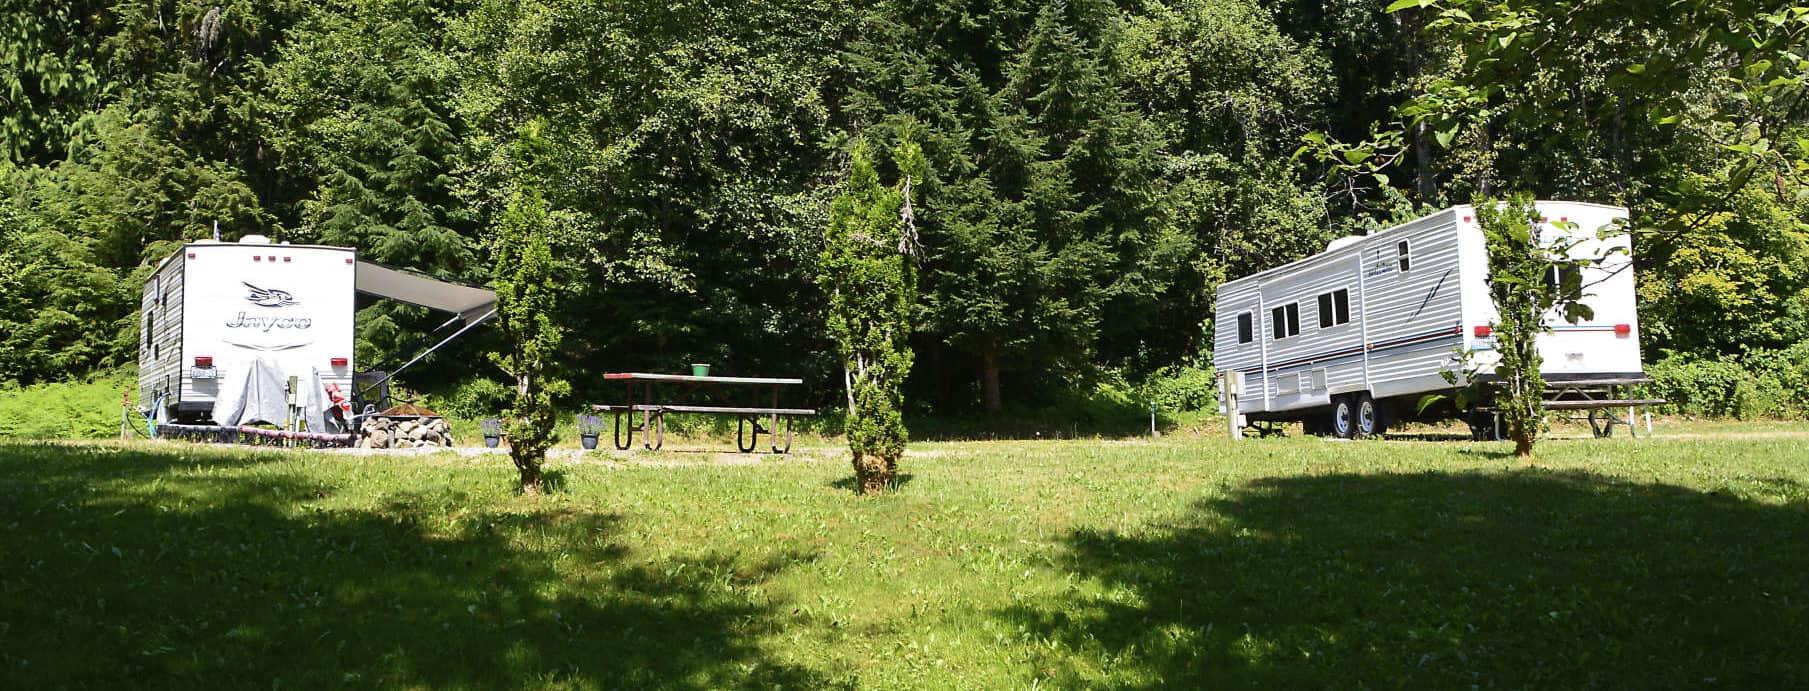 Ashford RV Camping